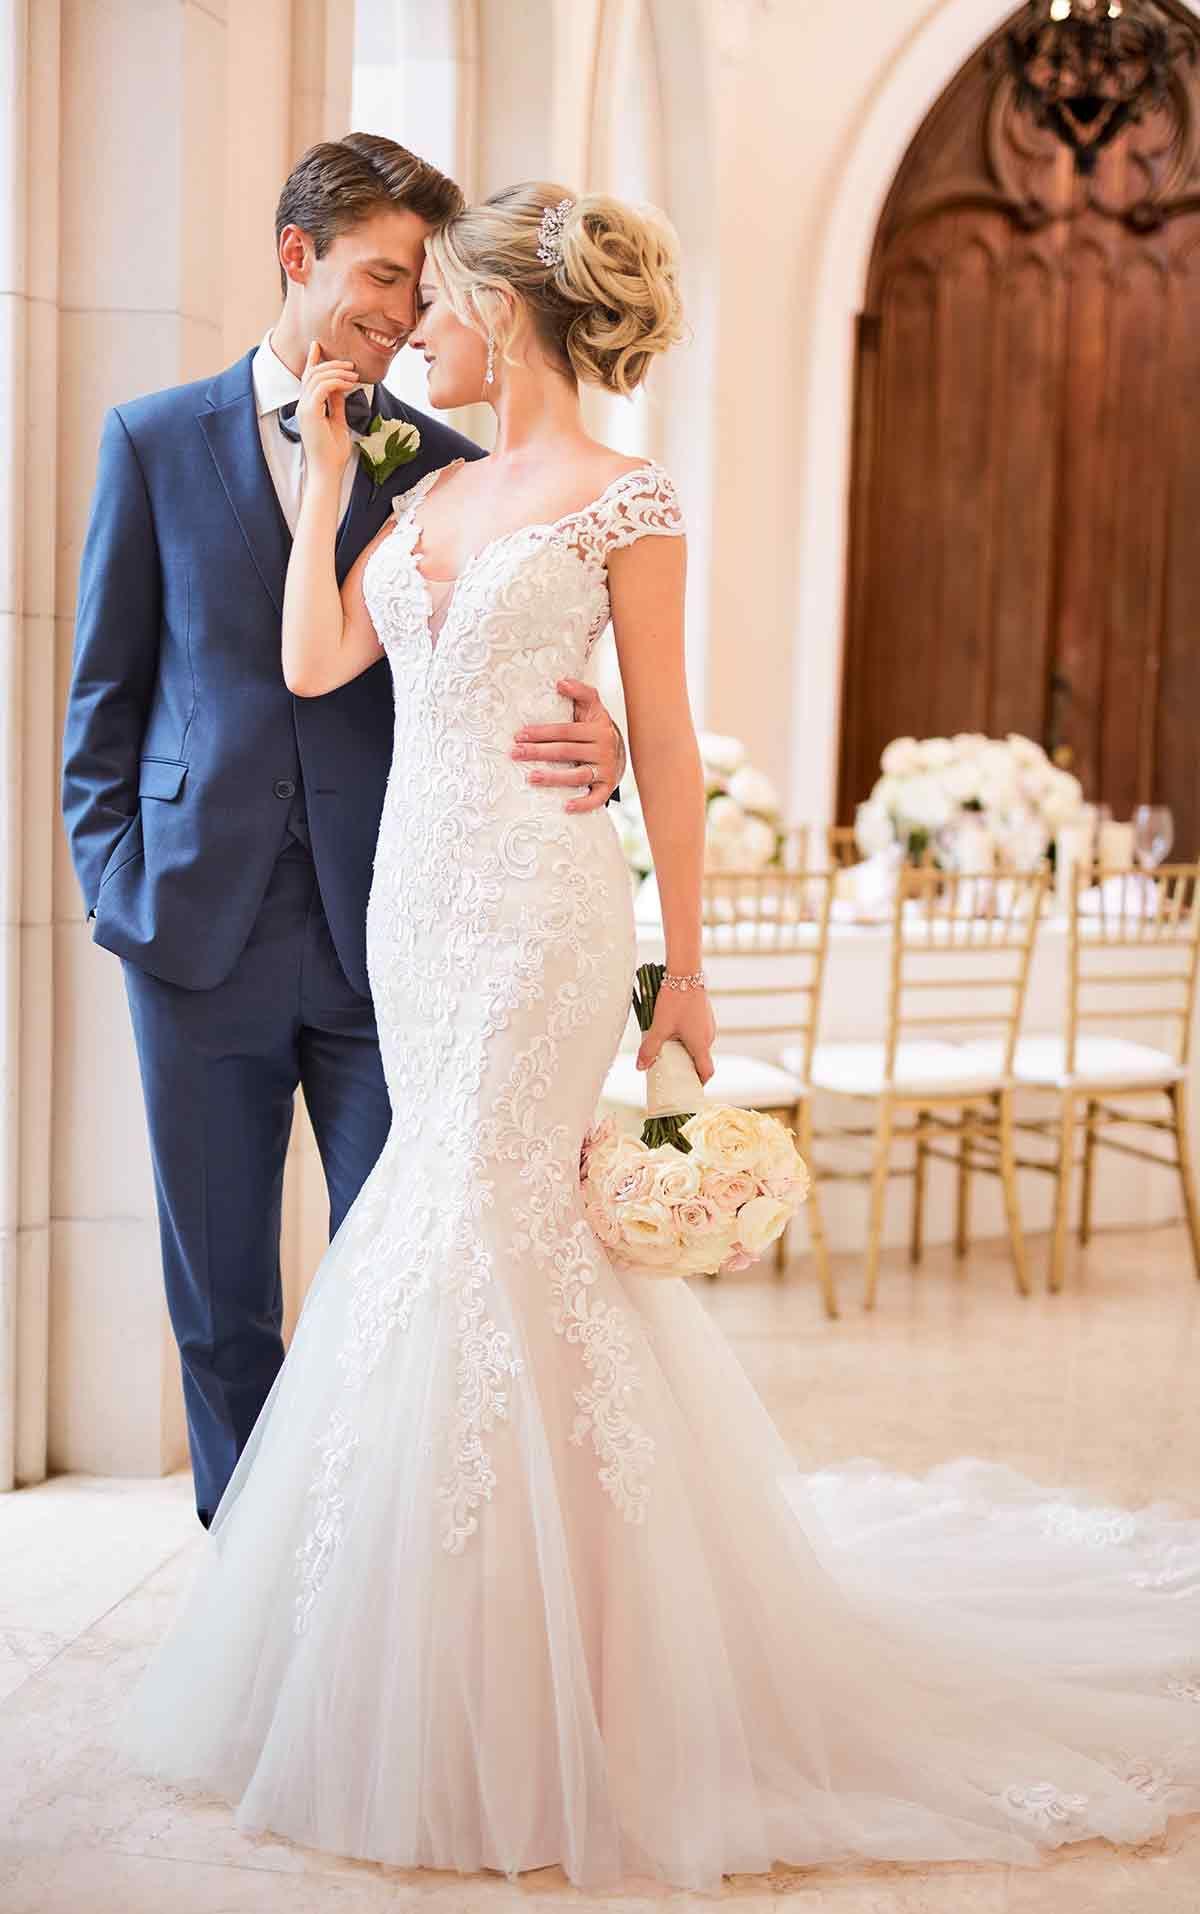 Berta Wedding Dresses Fall 2020 Napoli Collection Dress For The Wedding Wedding Dresses Berta Wedding Dress Bridal Dresses [ 1502 x 1000 Pixel ]